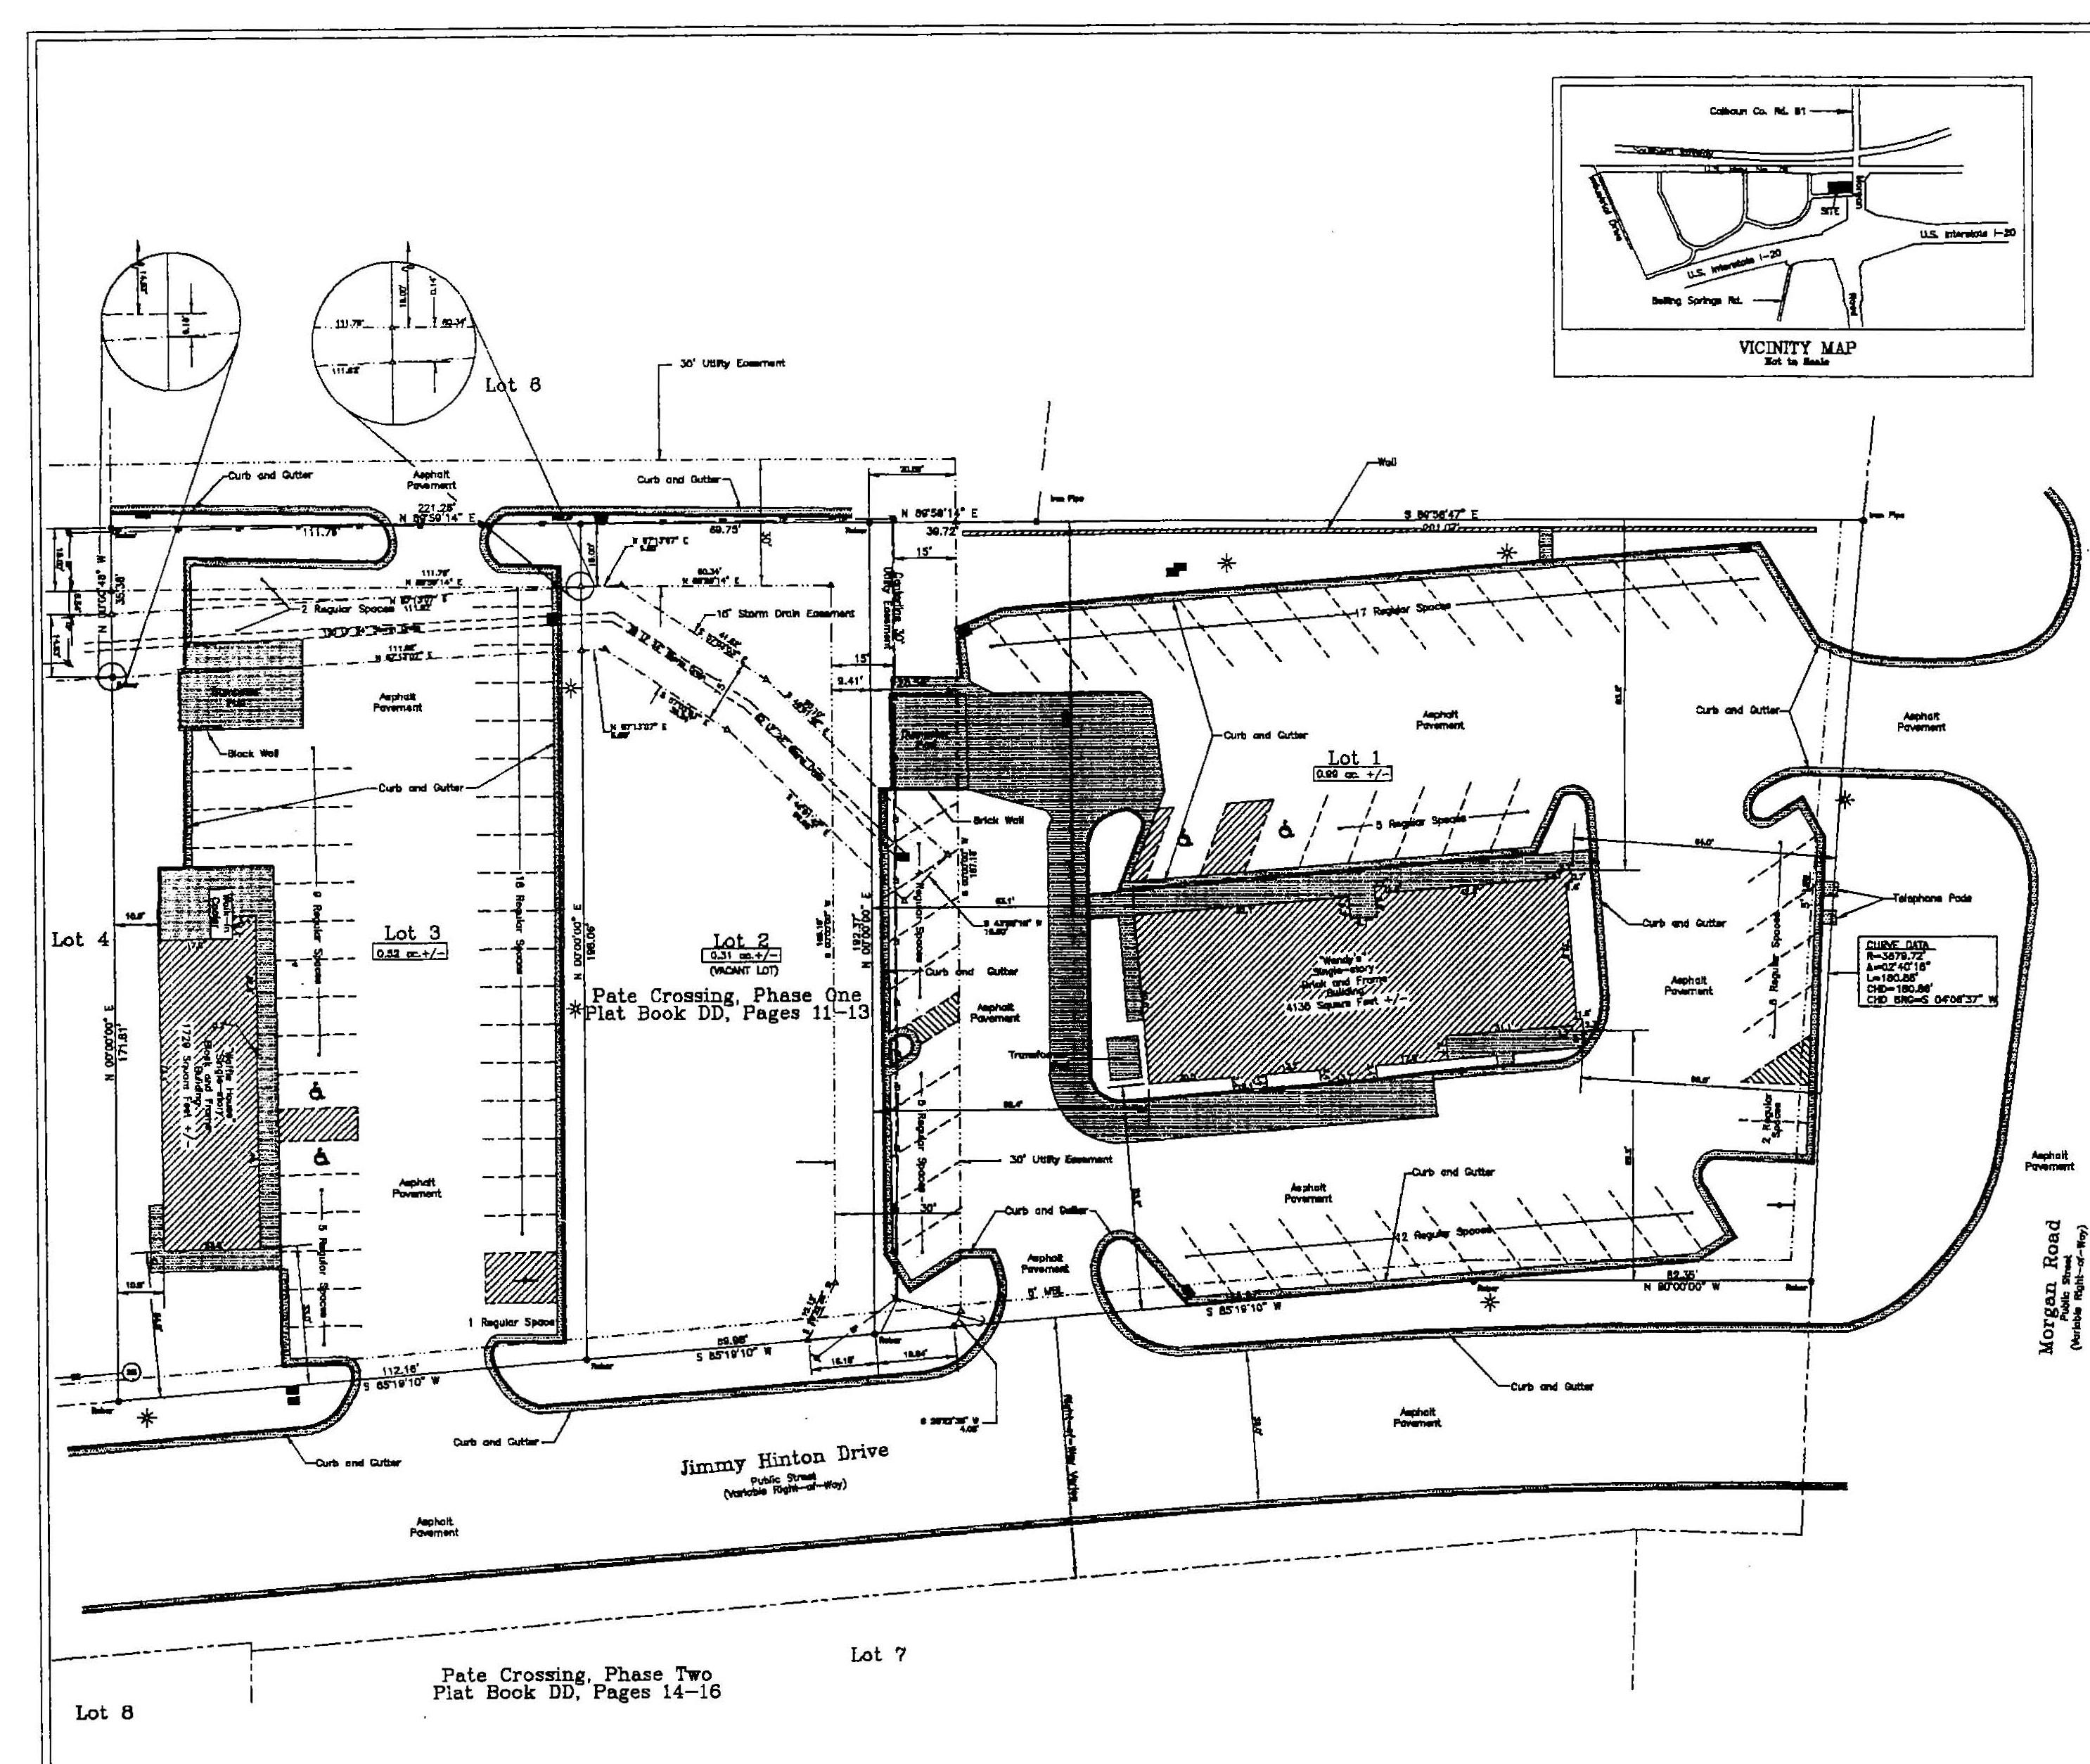 Lot 2 - ALTA-ACSM Land Title Survey Redu